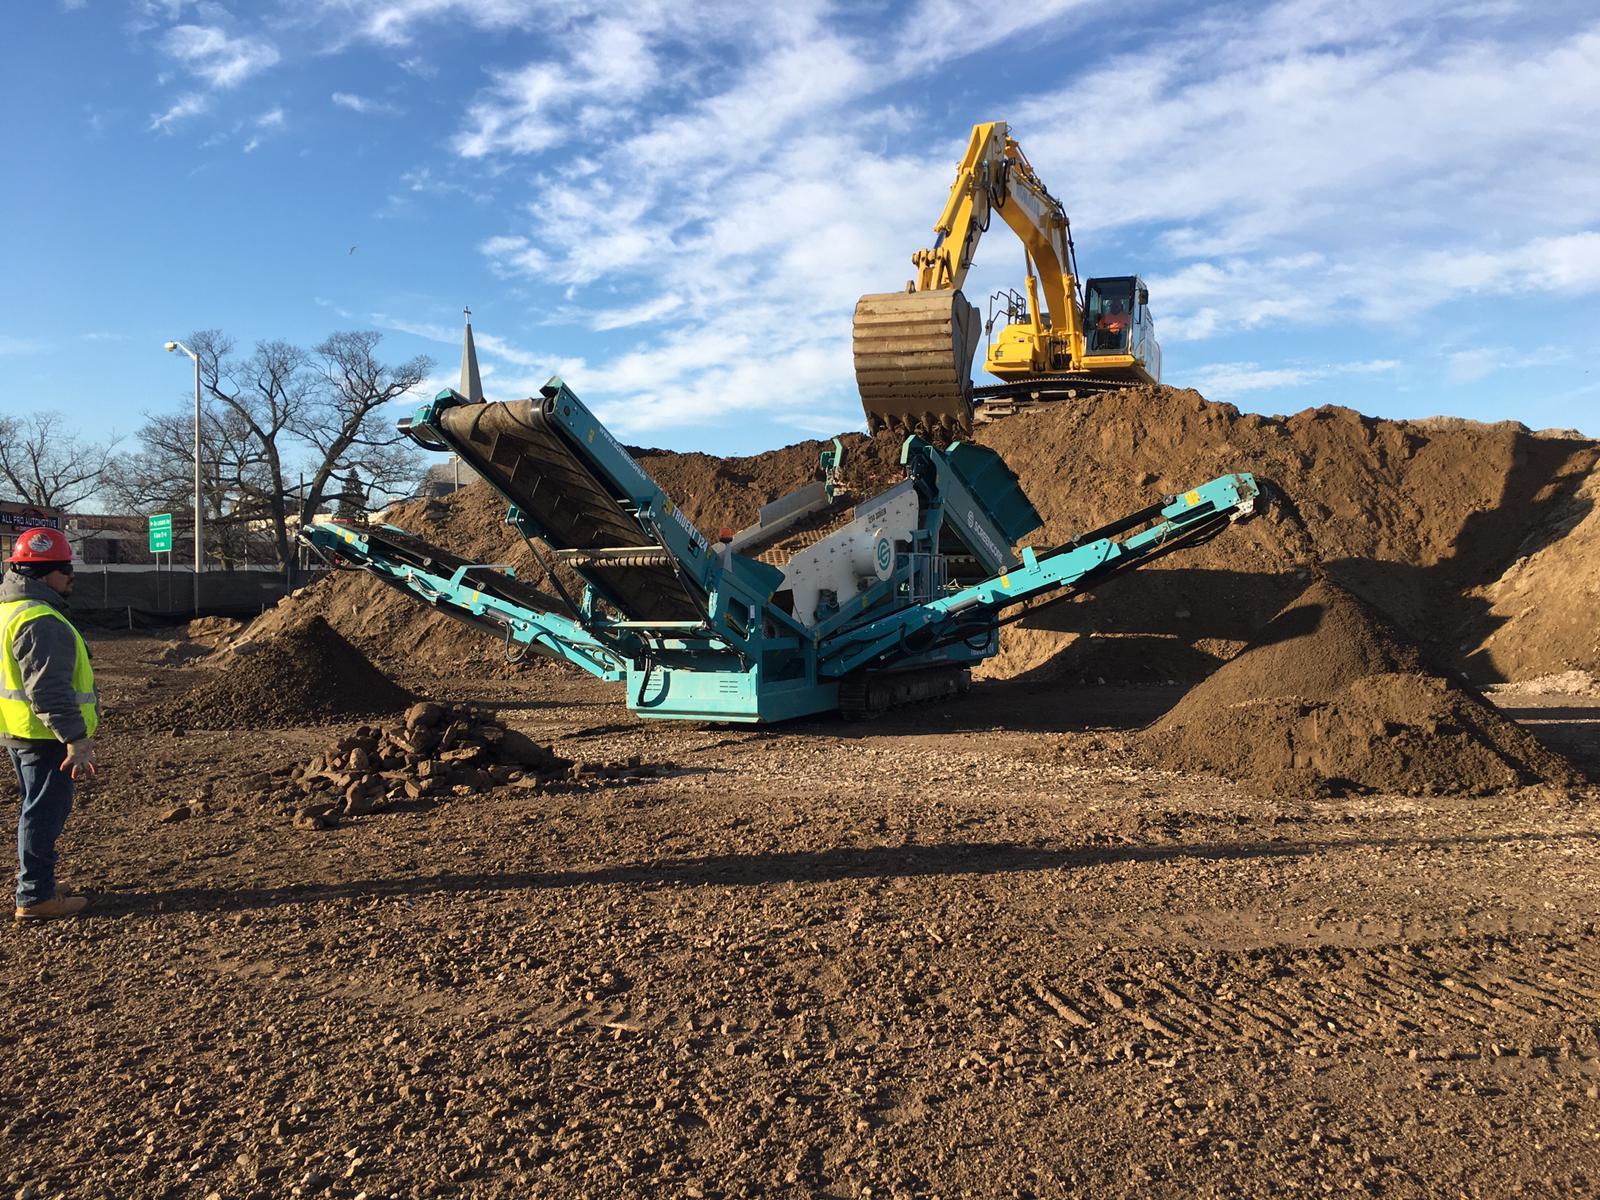 Trident 124 Screening soil from excavator